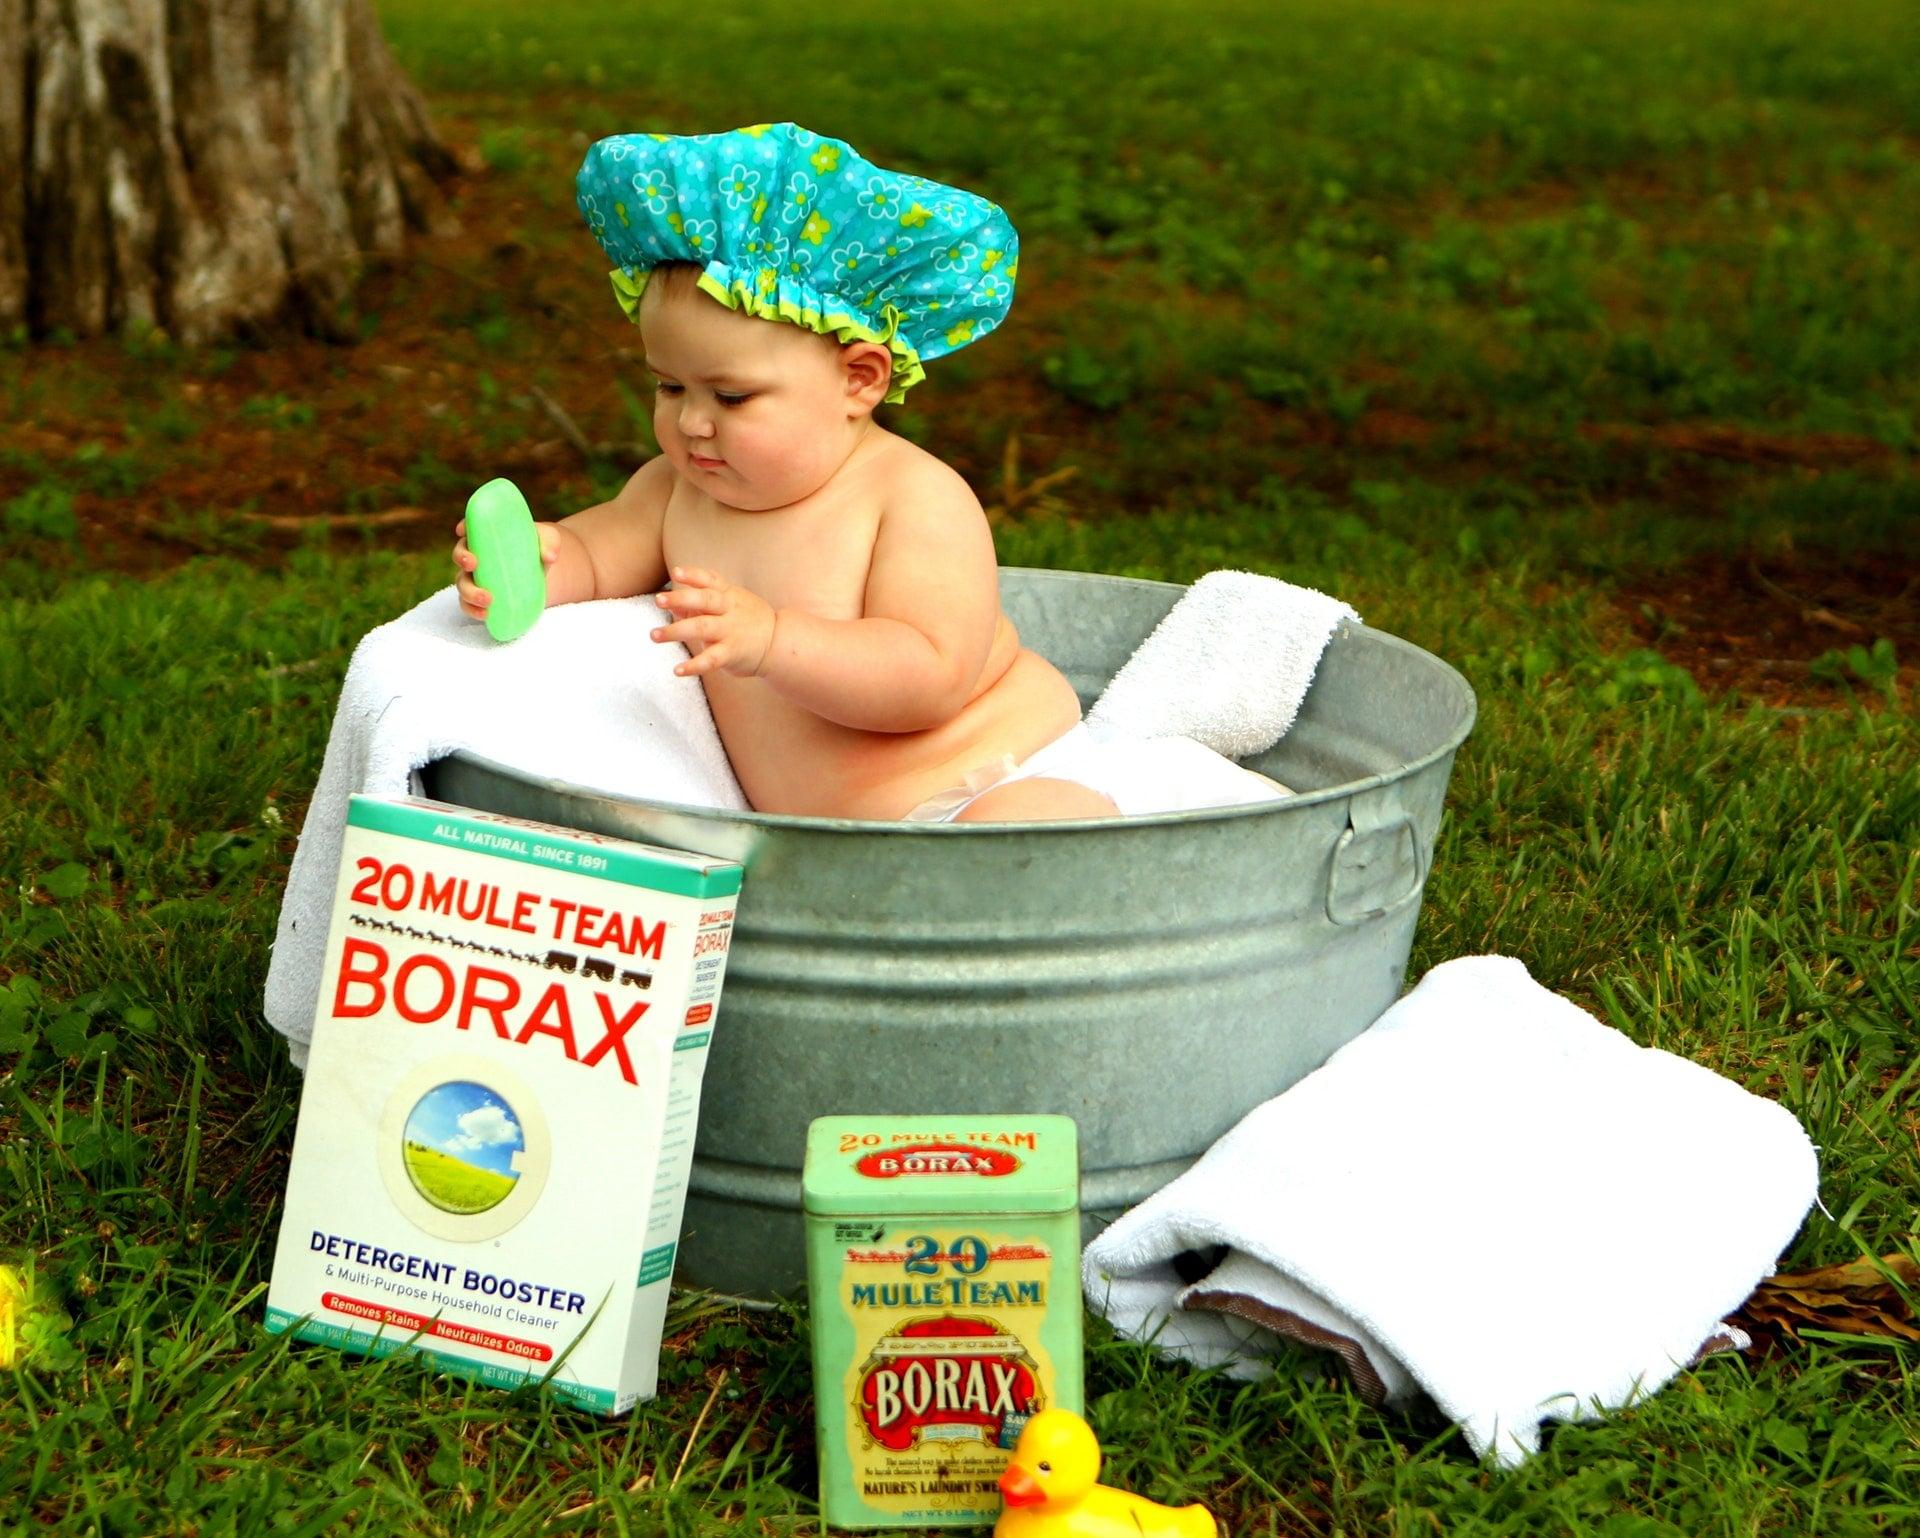 shirtless baby boy in galvanized tub Wash Hair 幼兒、孩童服用成藥、醫生處方用藥時之兒童用藥安全須知